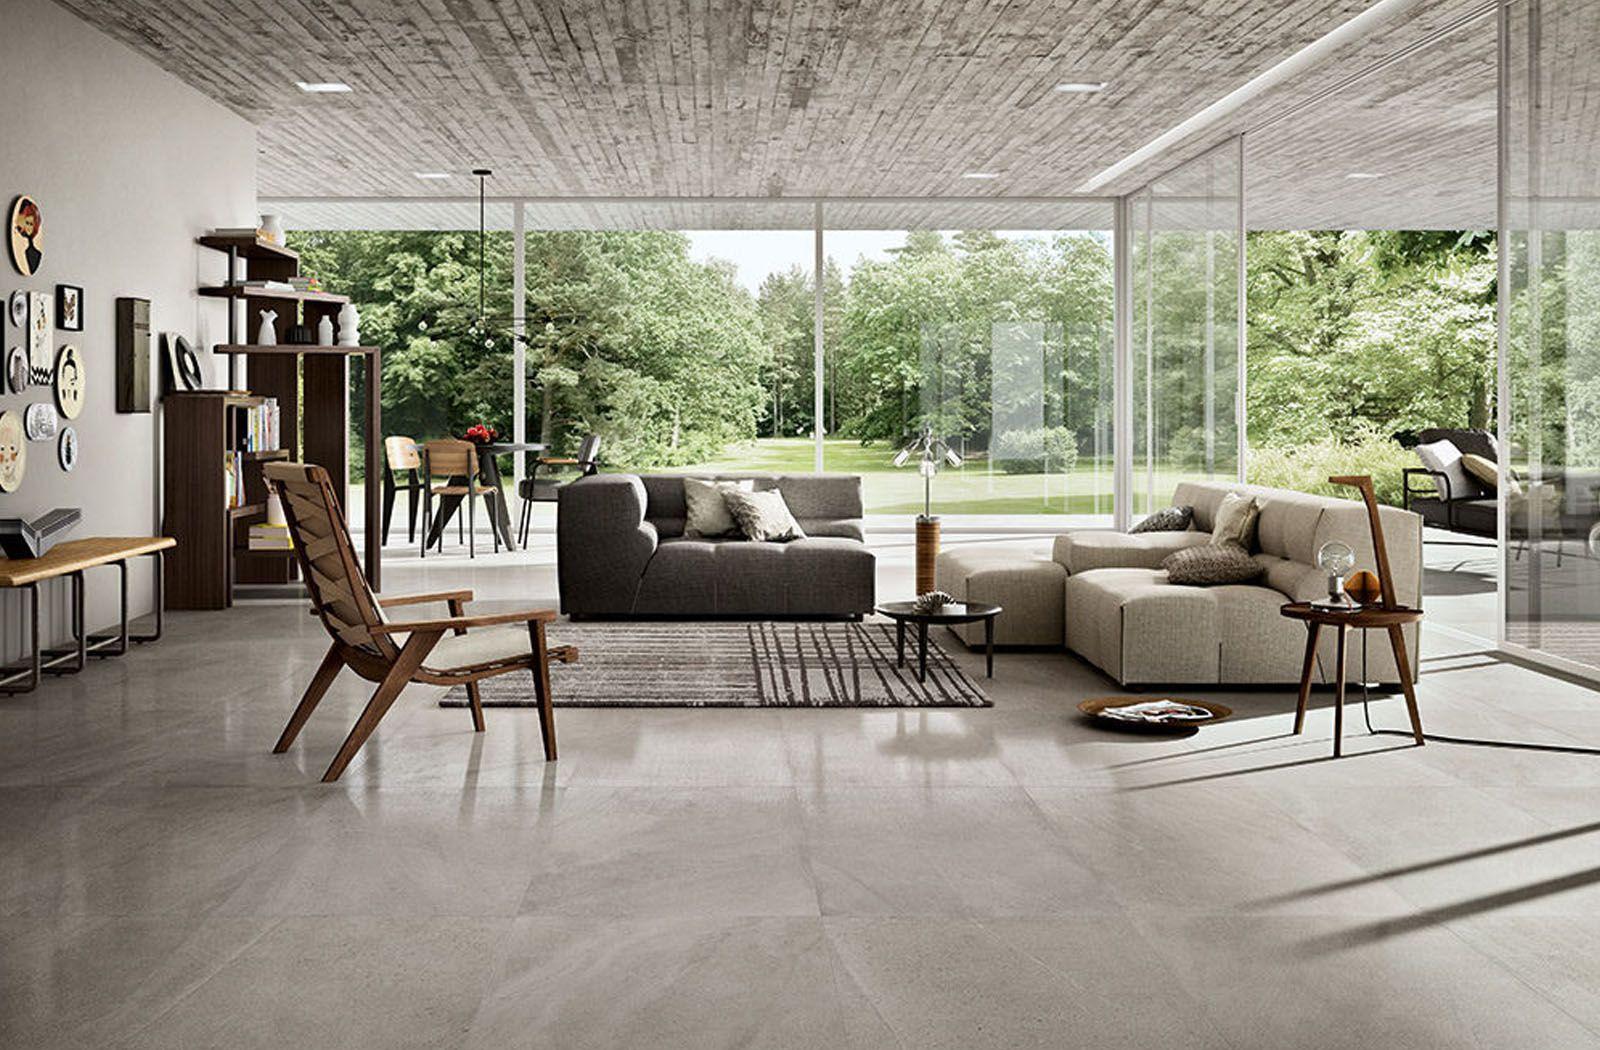 19 Tile Flooring Ideas For Living Room To Look Gorgeous Lantai Ubin